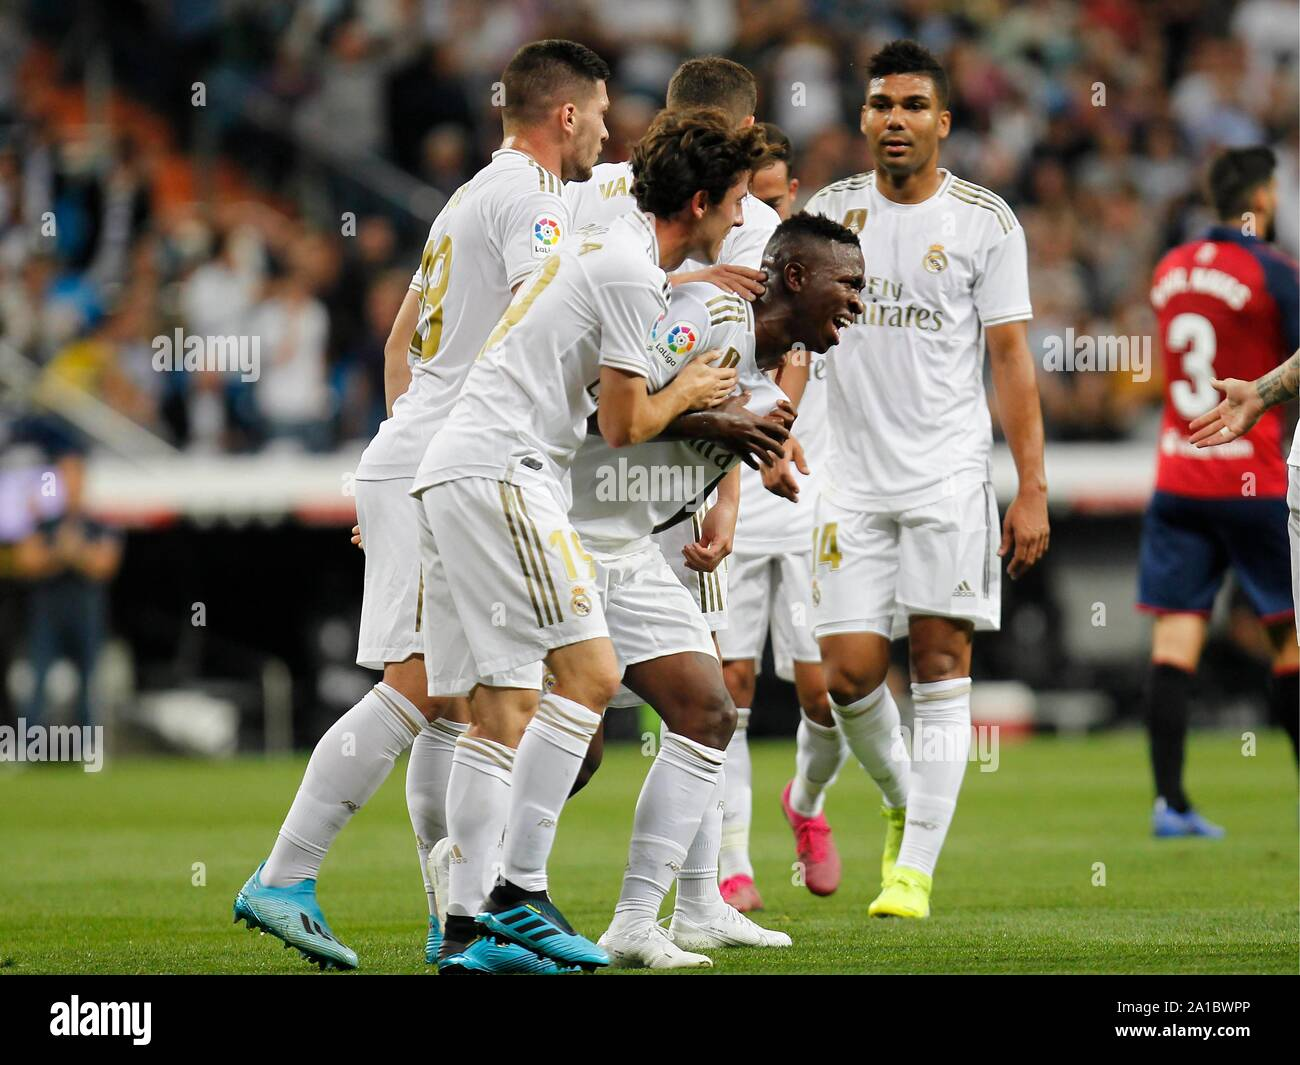 Madrid Spain 25th Sep 2019 Soccer Match Between Real Madrid Vs